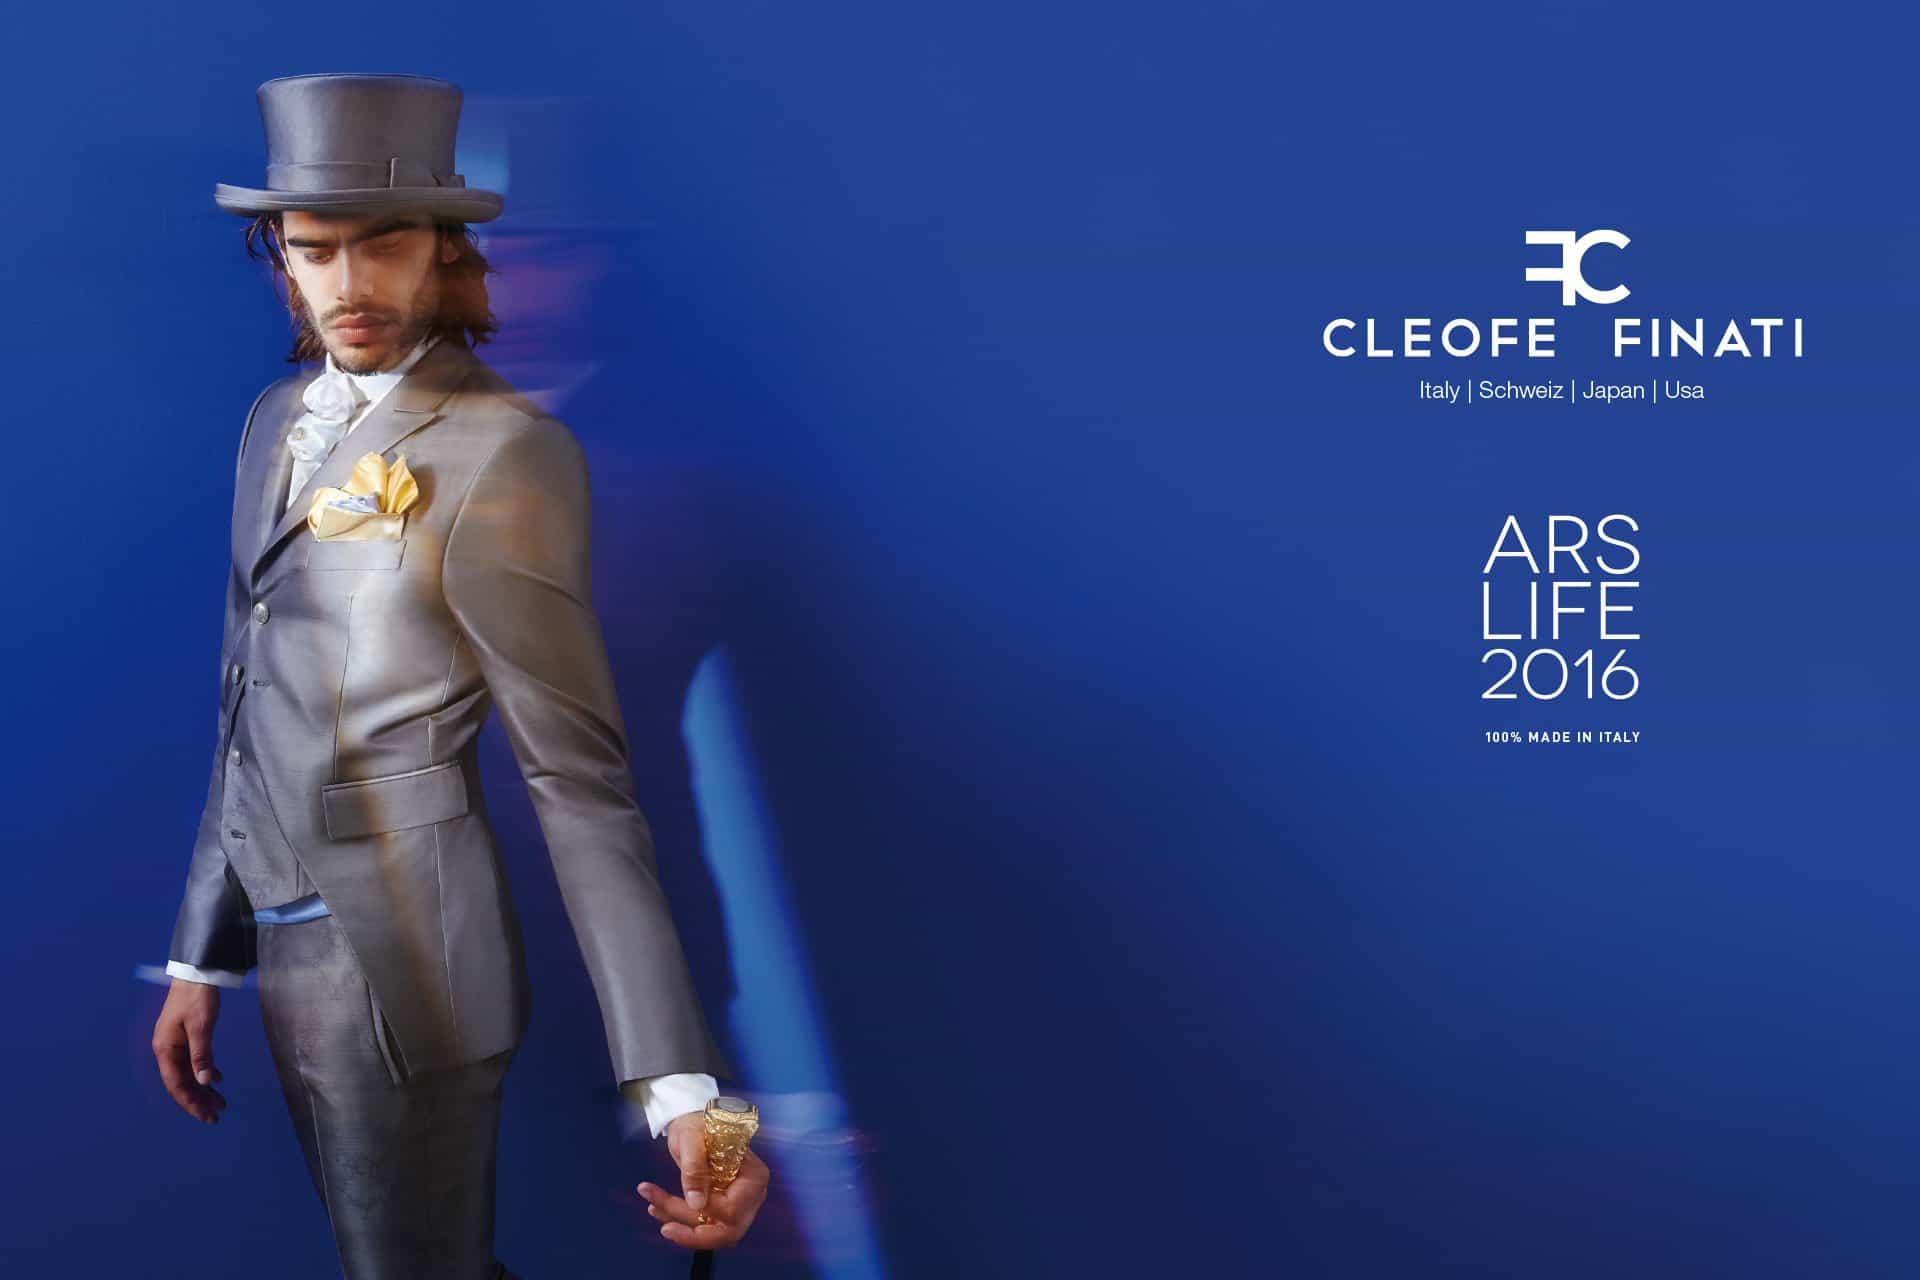 cleofe_arslife_adv